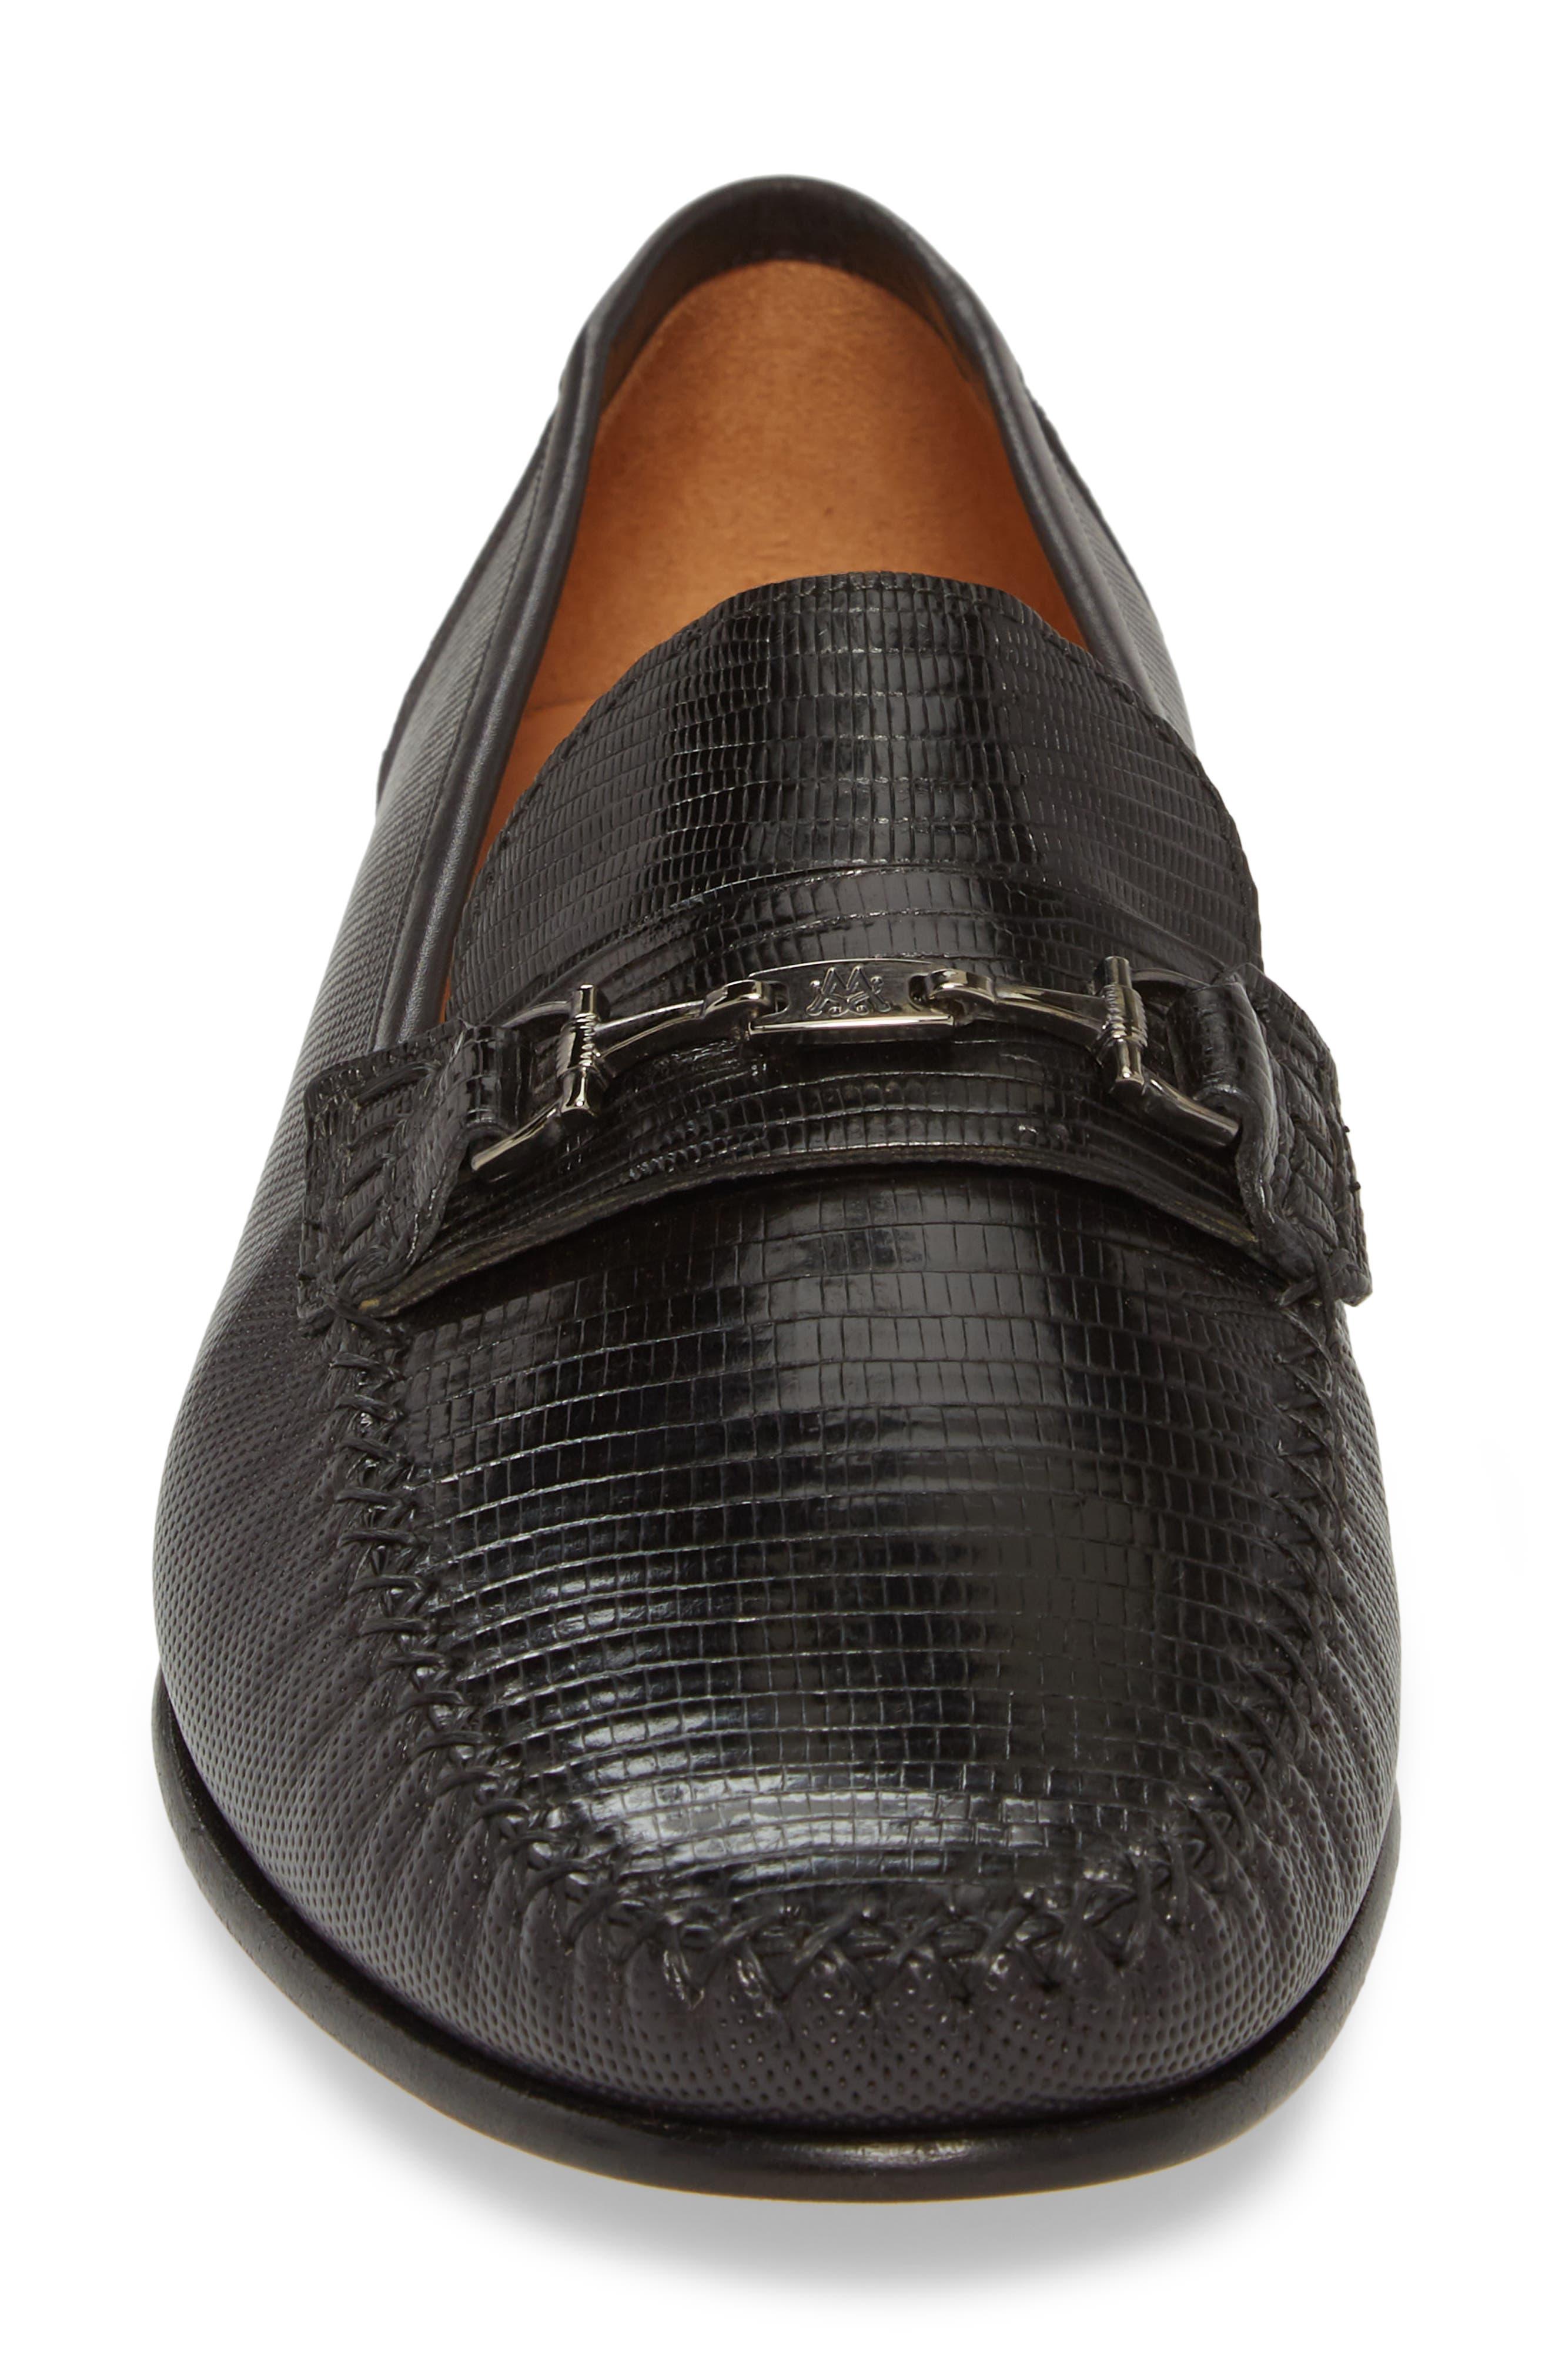 Sileno Lizard Loafer,                             Alternate thumbnail 4, color,                             Black Leather